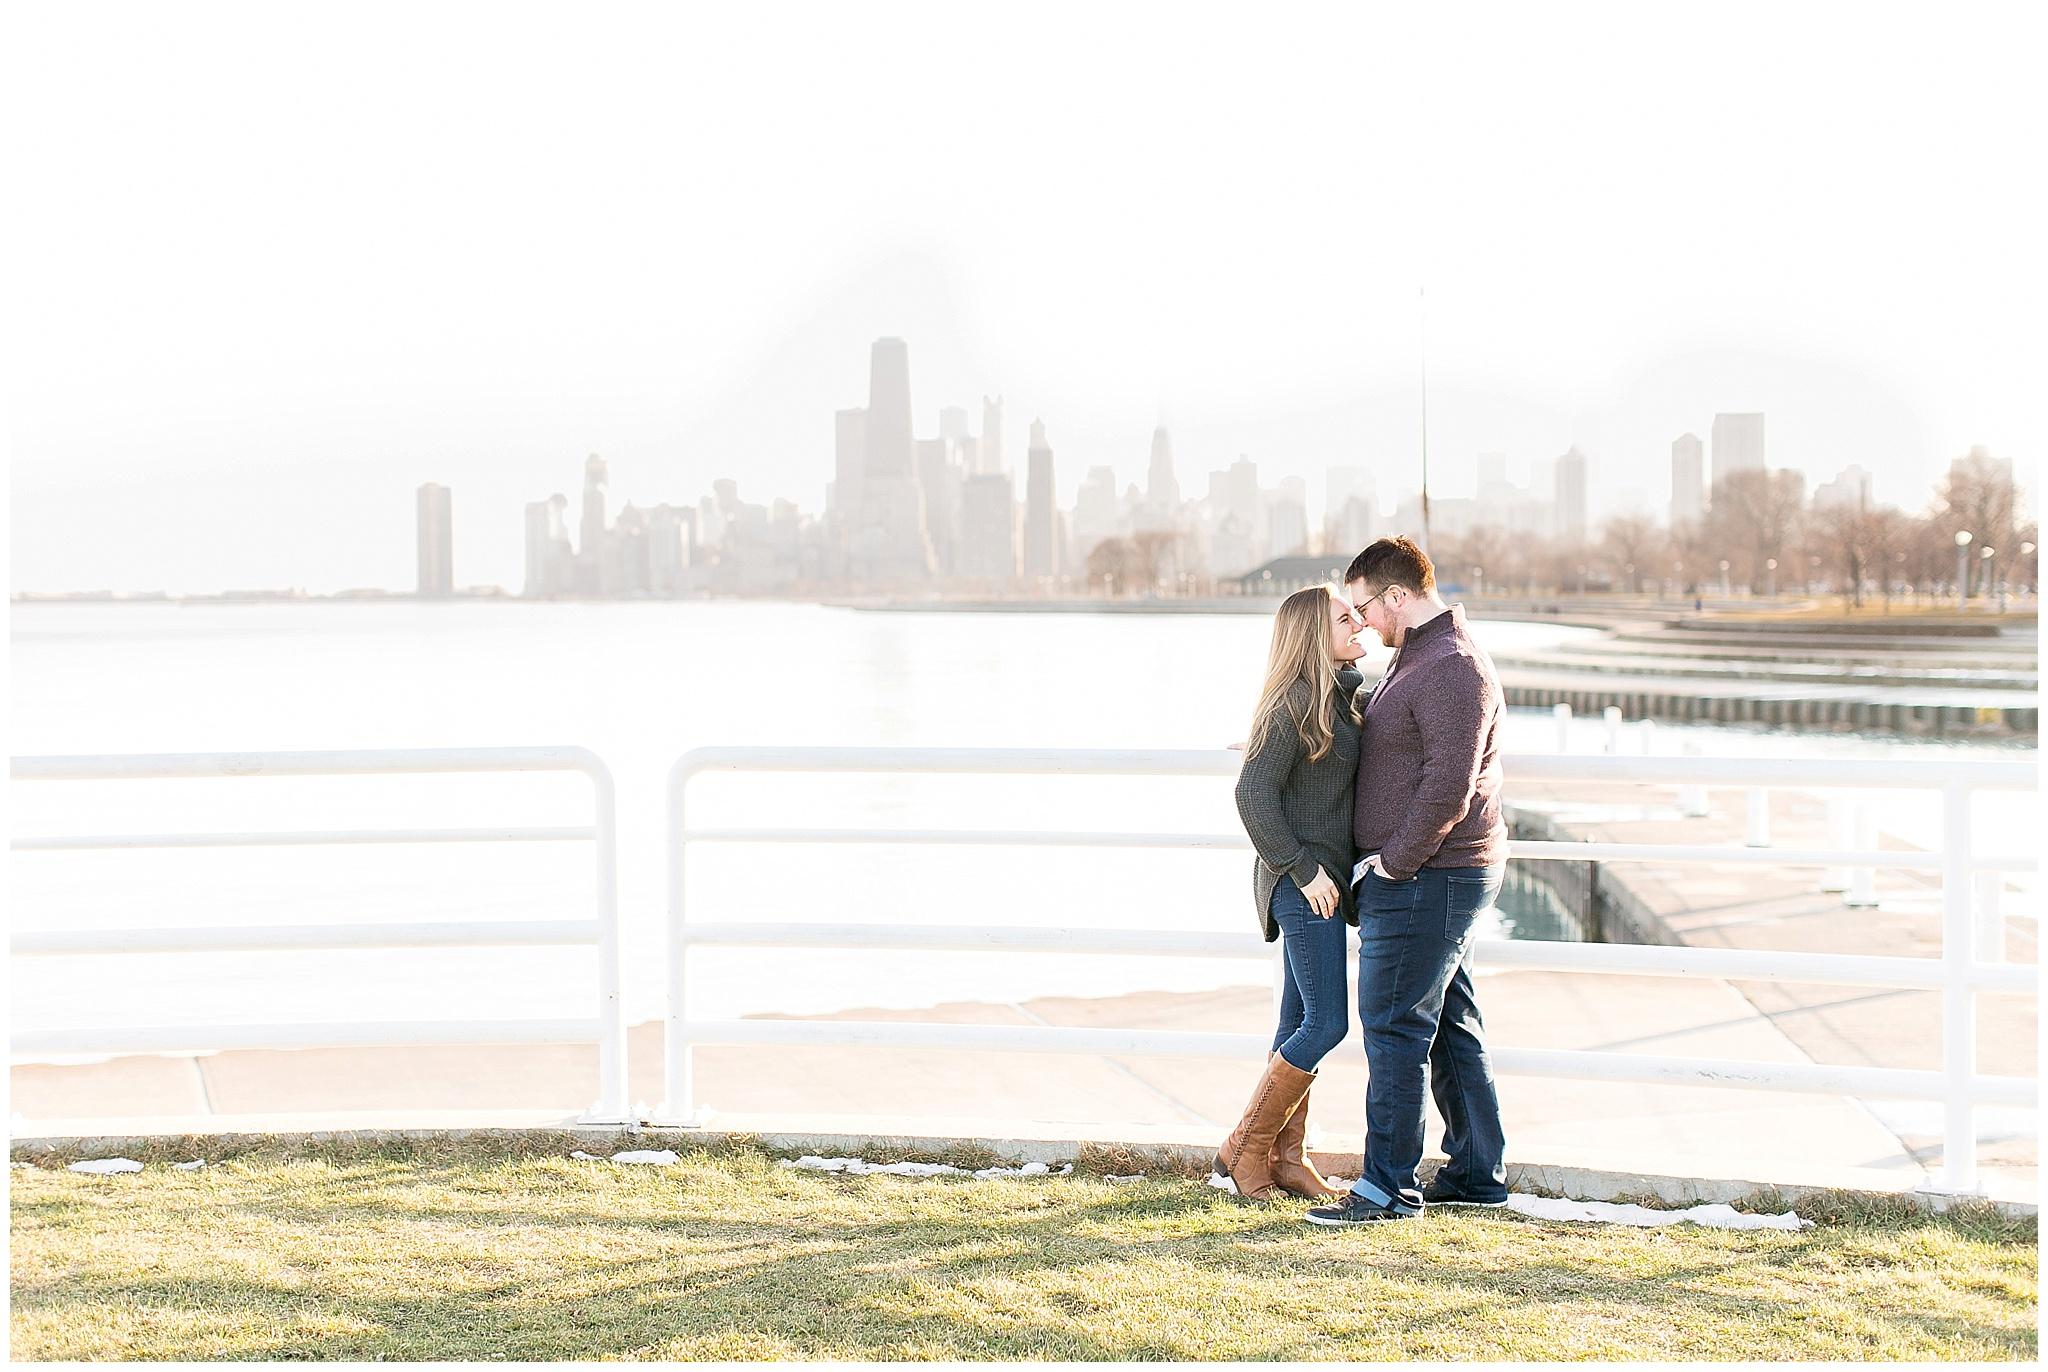 Chicago_Engagement_and_wedding_photographer_chicago_skyline_0963.jpg